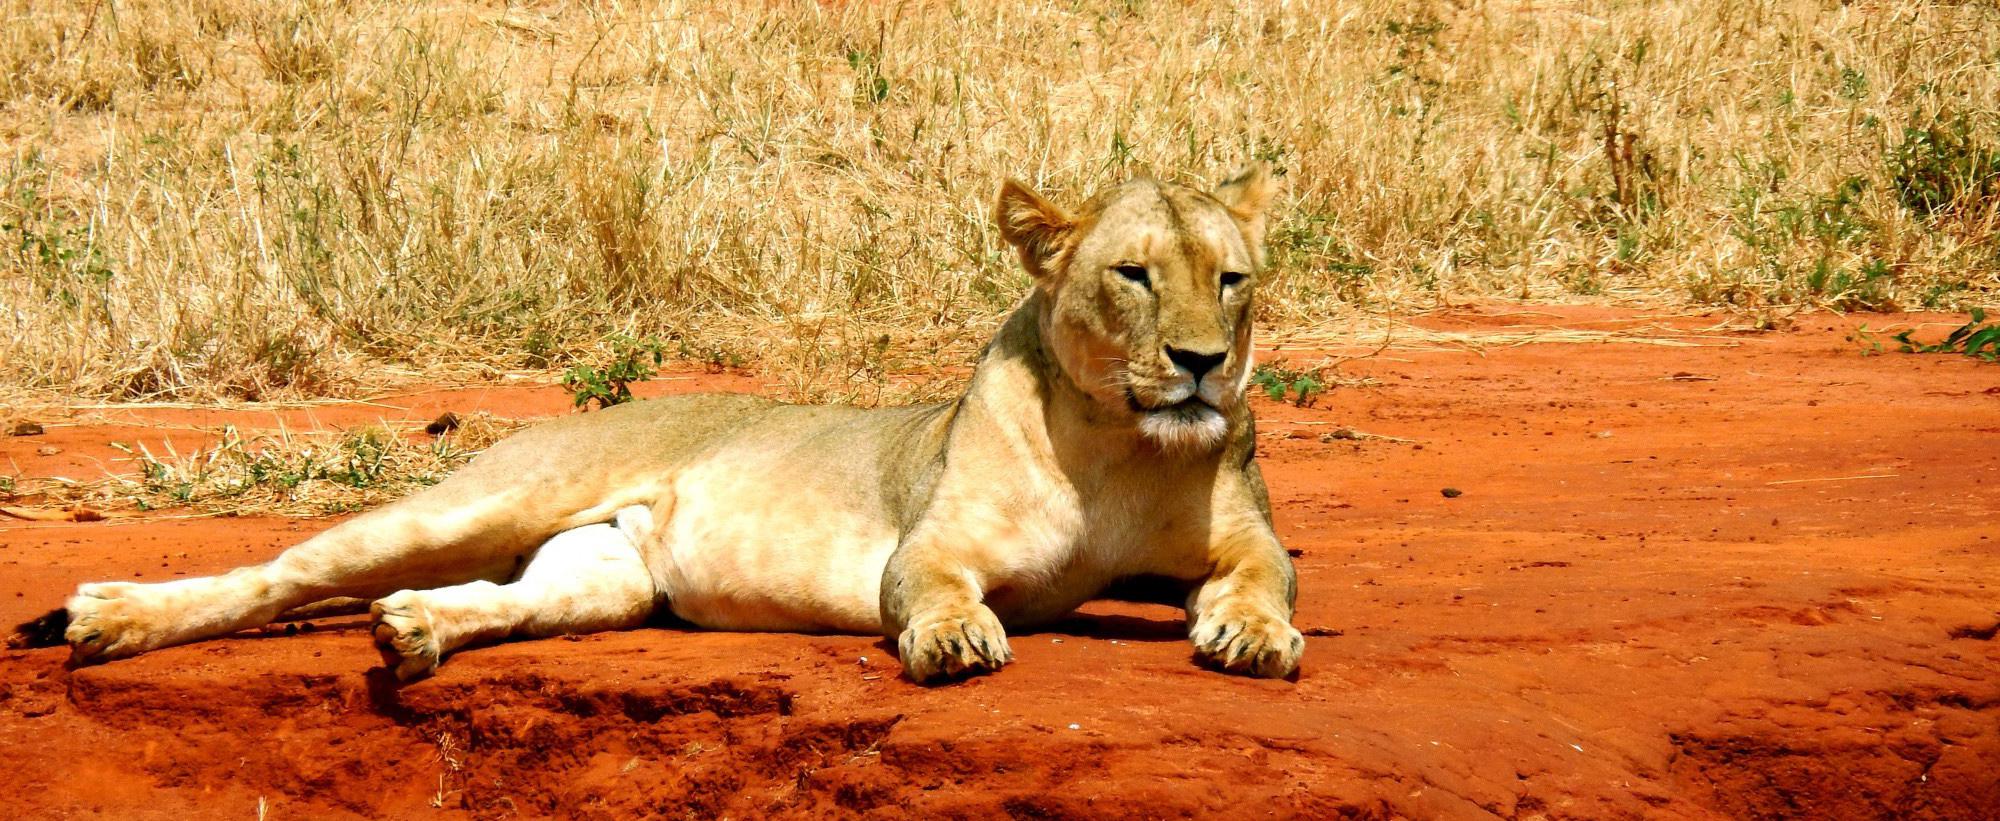 Kenya-humanitarian-trip-2-safari-lioness-globecandy-e1448807796779_ORIZ